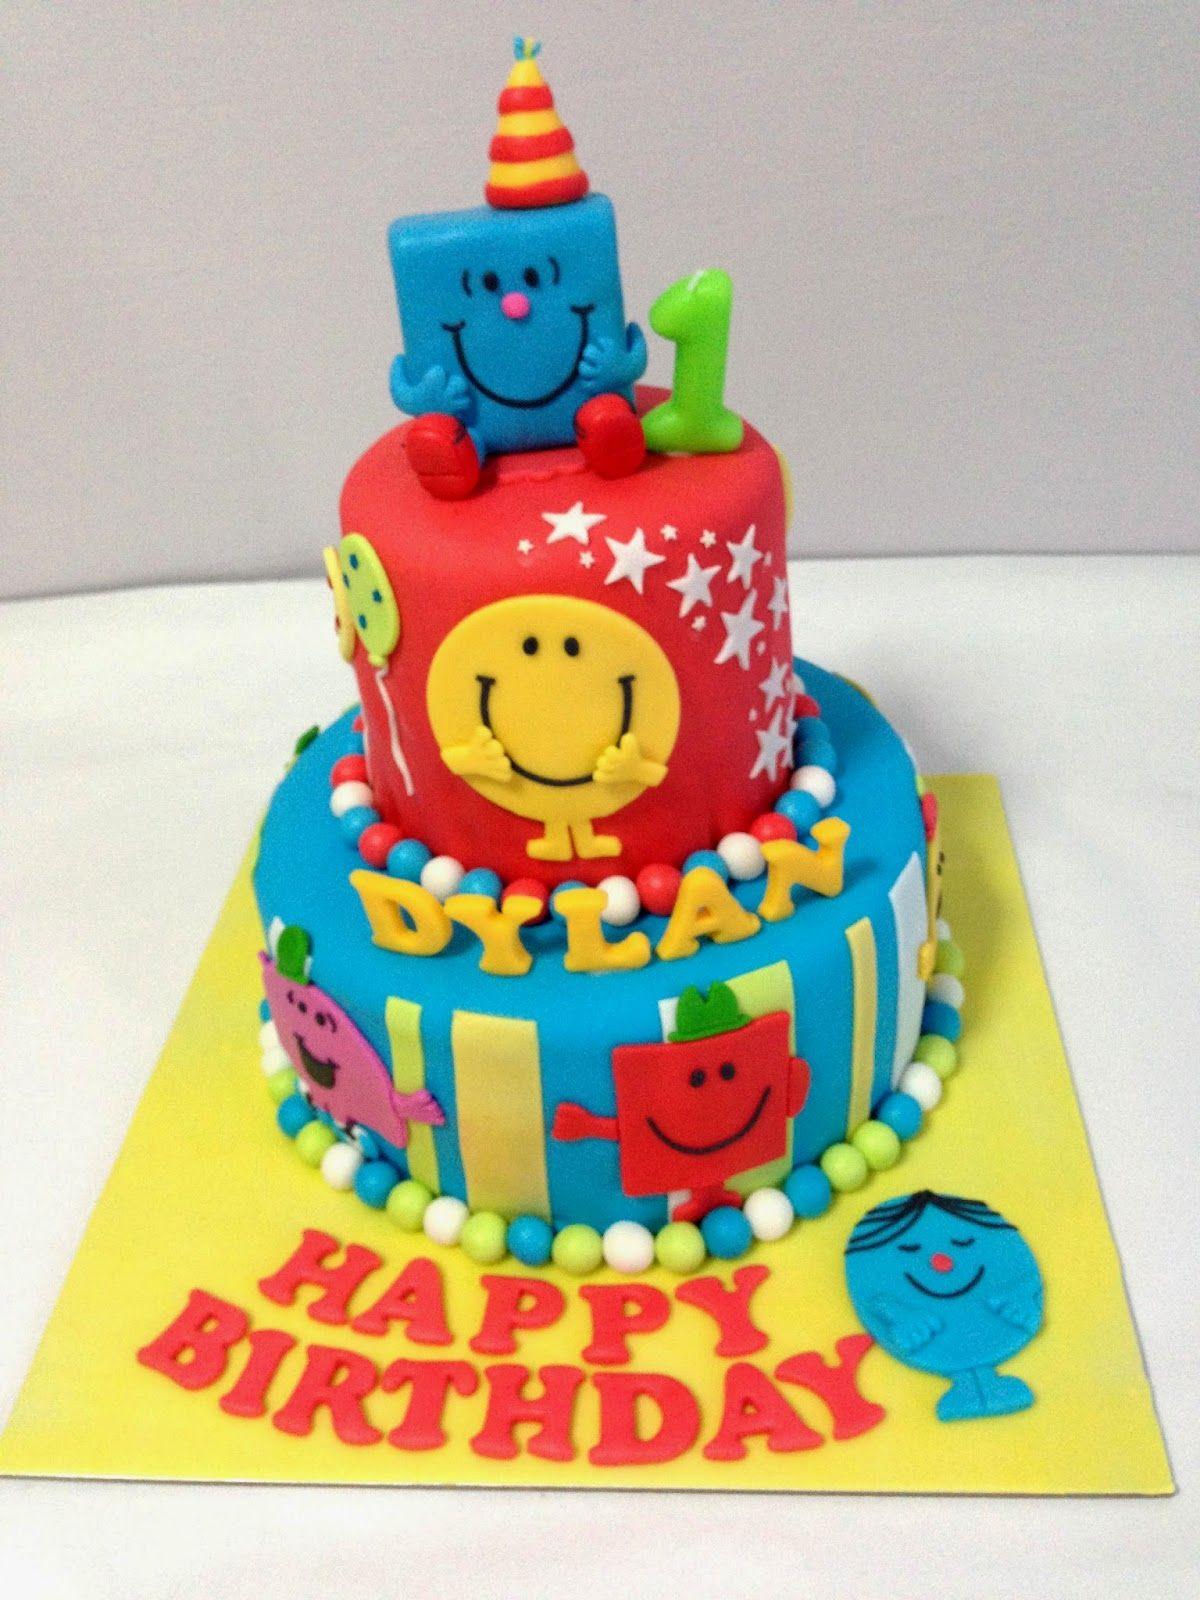 Oven Creations Happy St Birthday Dylan Mr Men Birthday Party - Mr tickle birthday cake